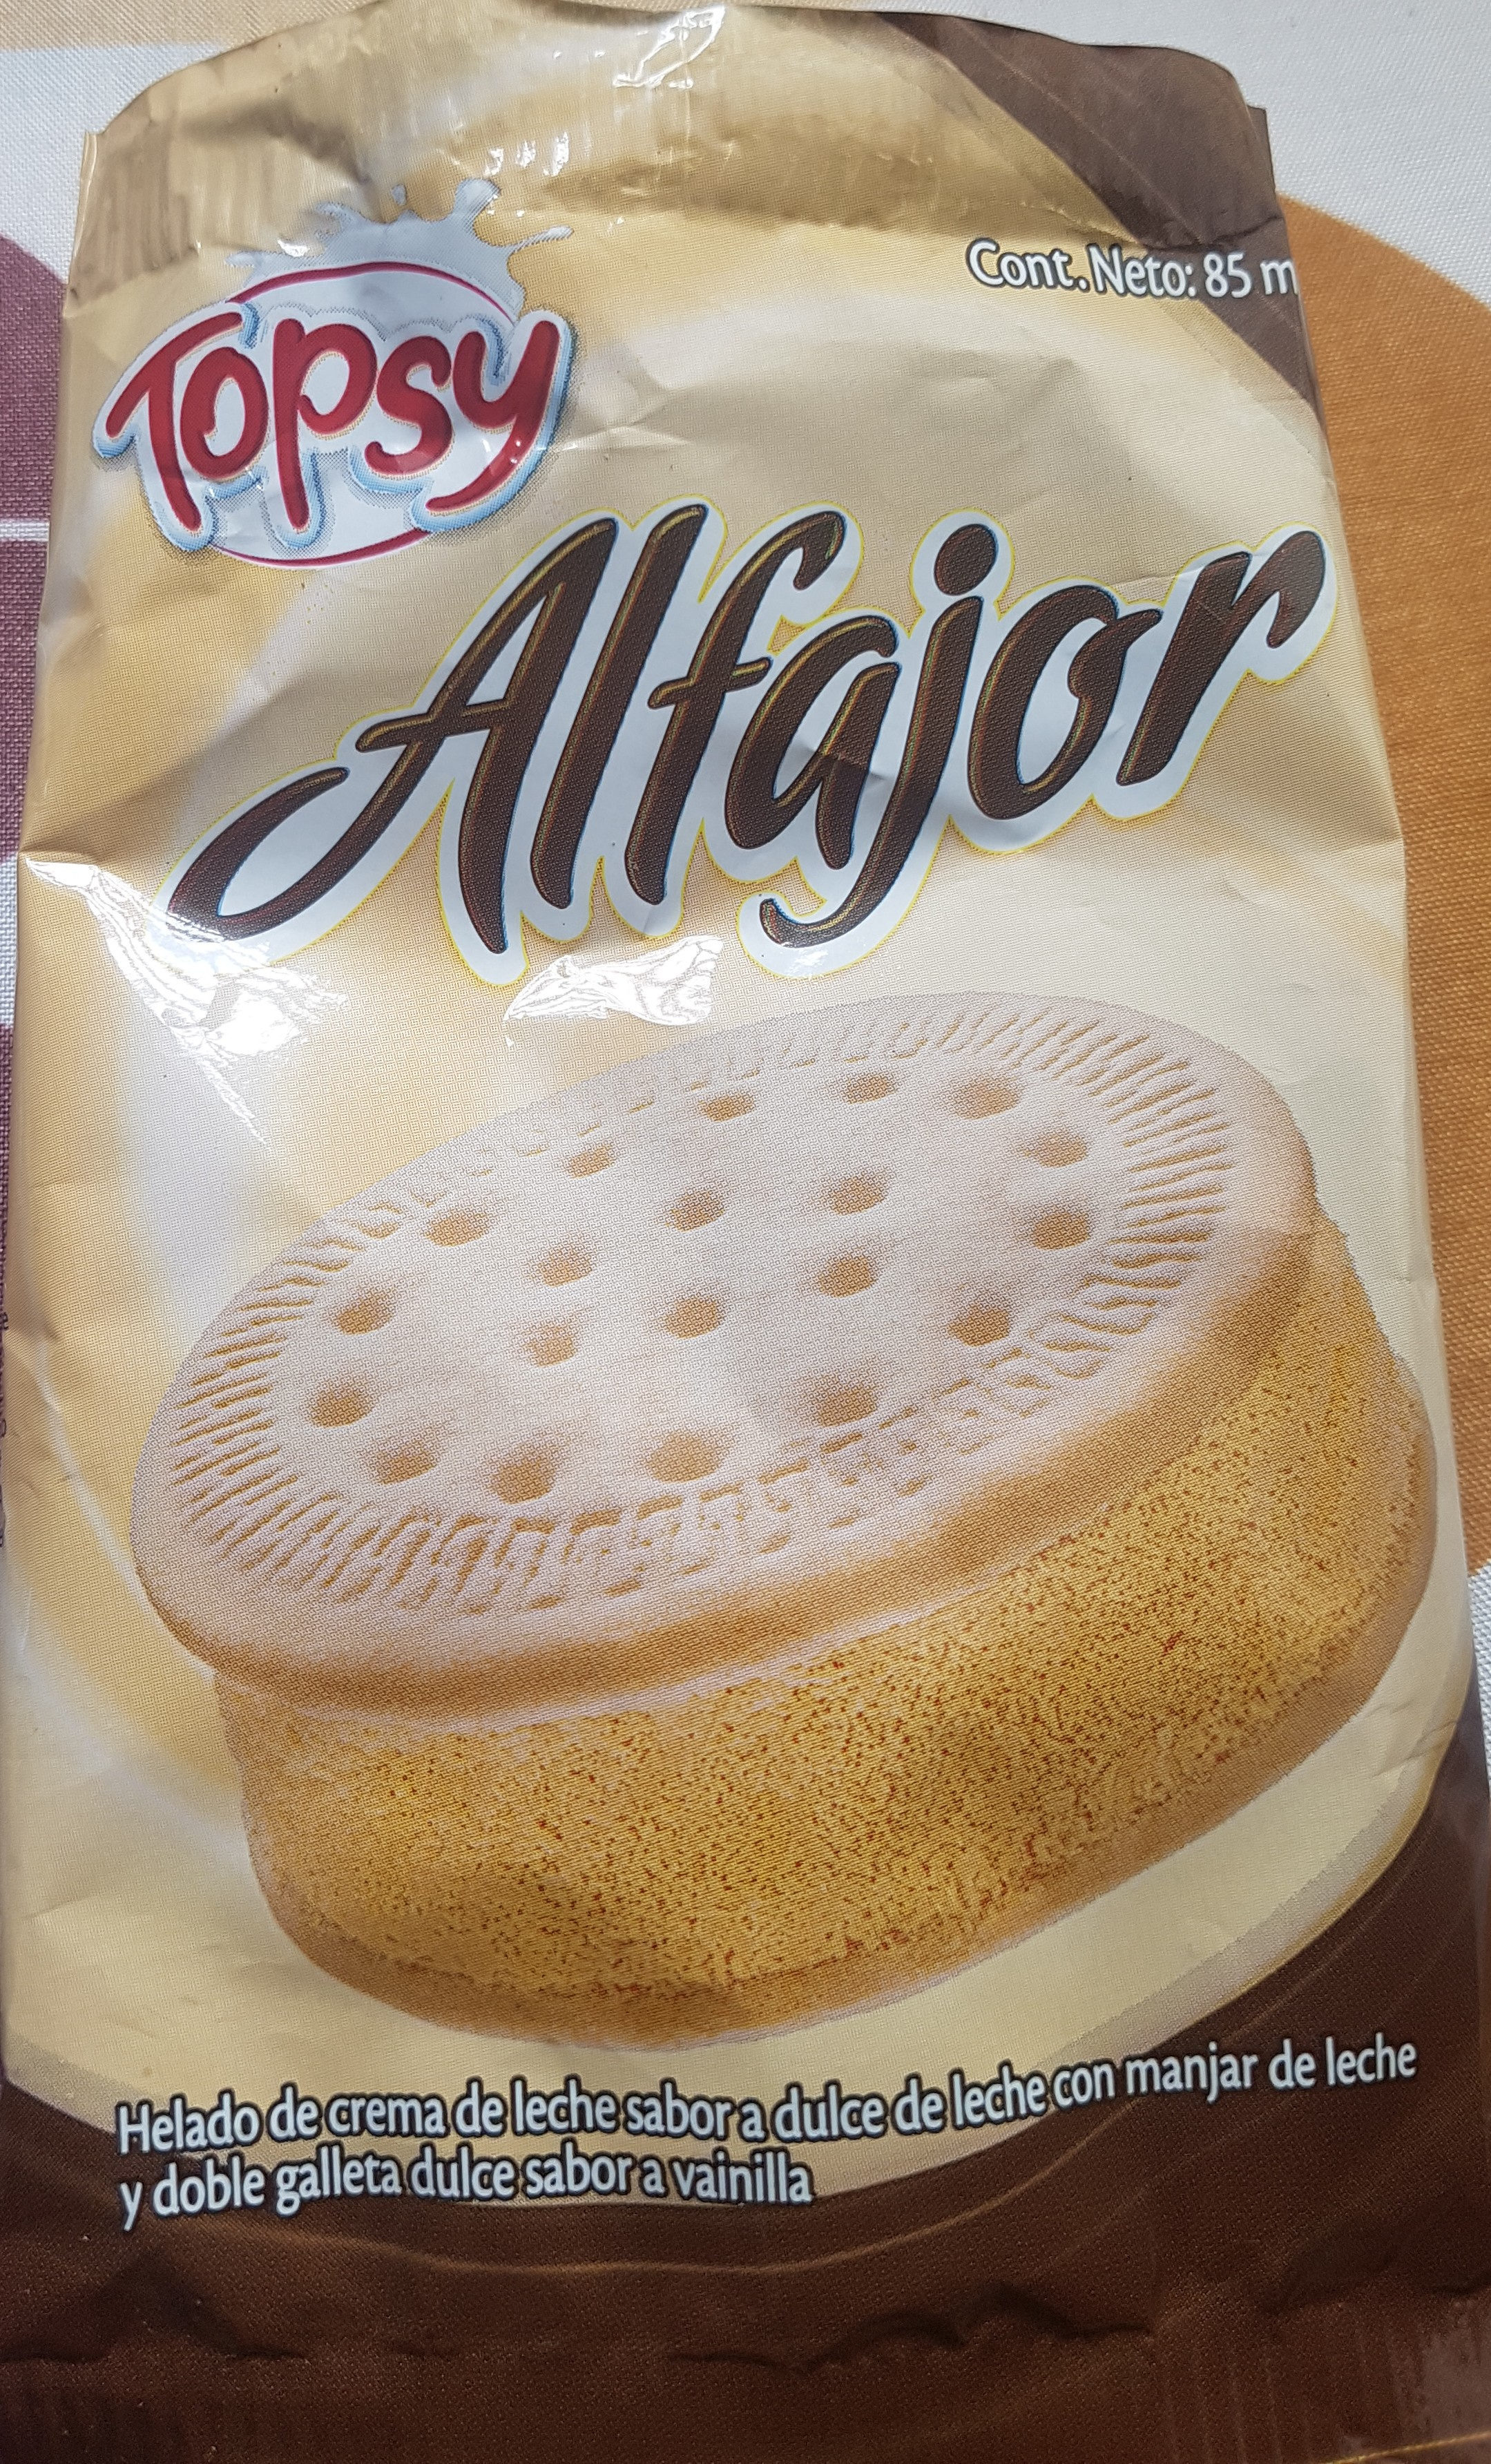 Alfajor - Product